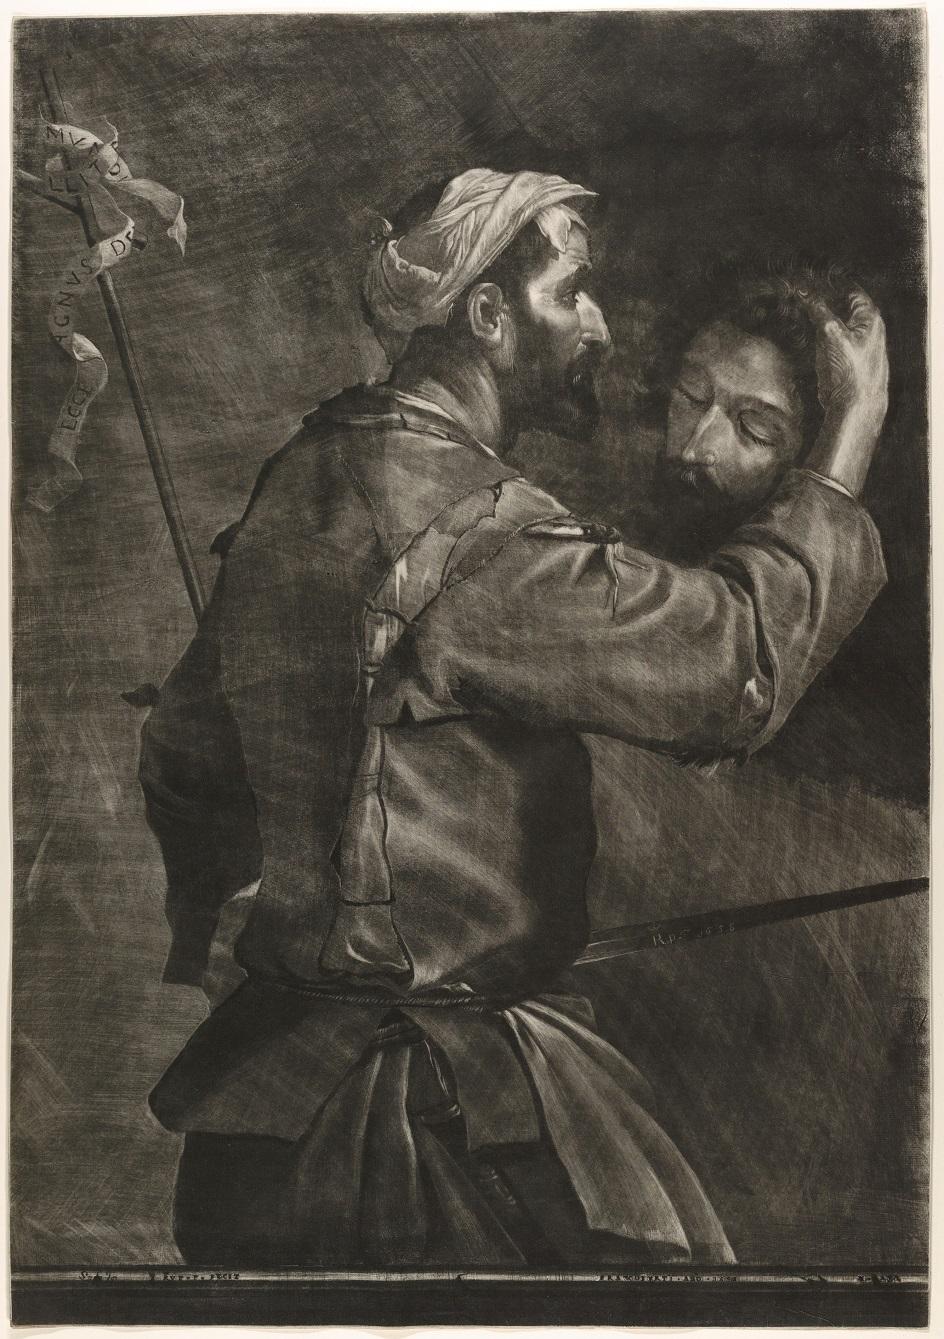 Меццо-тинто. Принц Руперт Рейнский. Гравюра «Великий палач», 1685